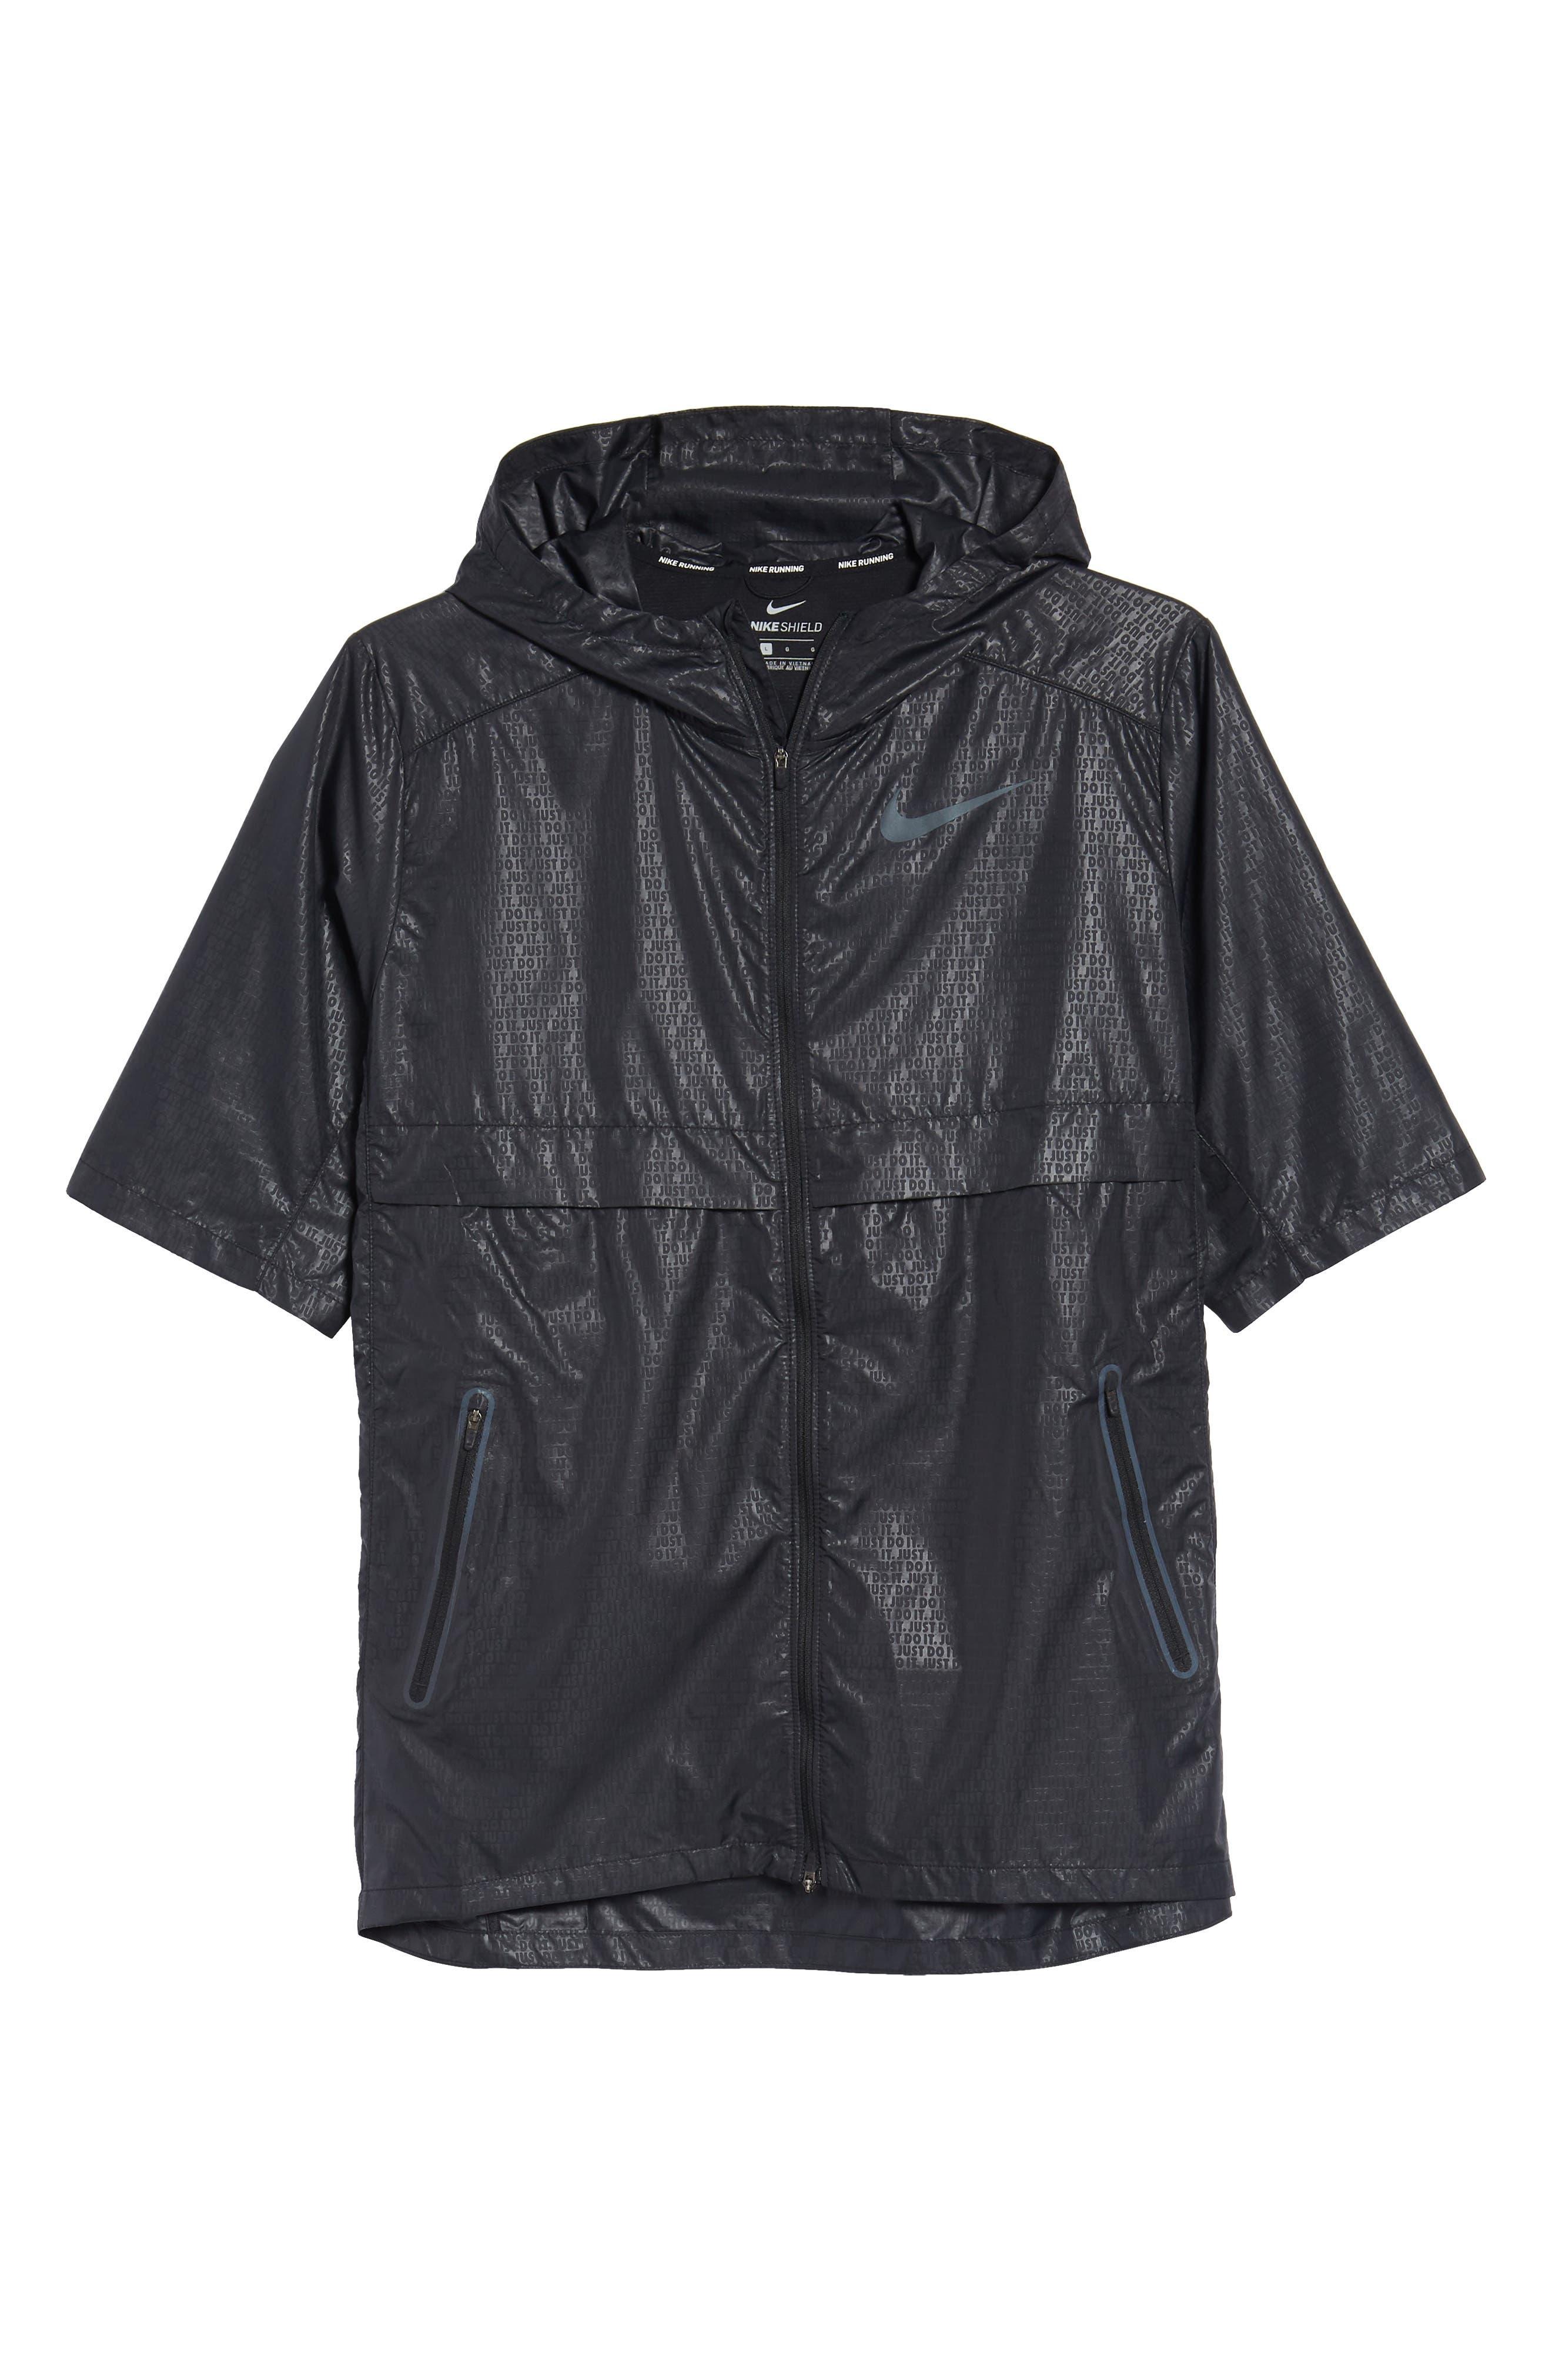 Running Shield Short Sleeve Hooded Jacket,                             Alternate thumbnail 6, color,                             BLACK